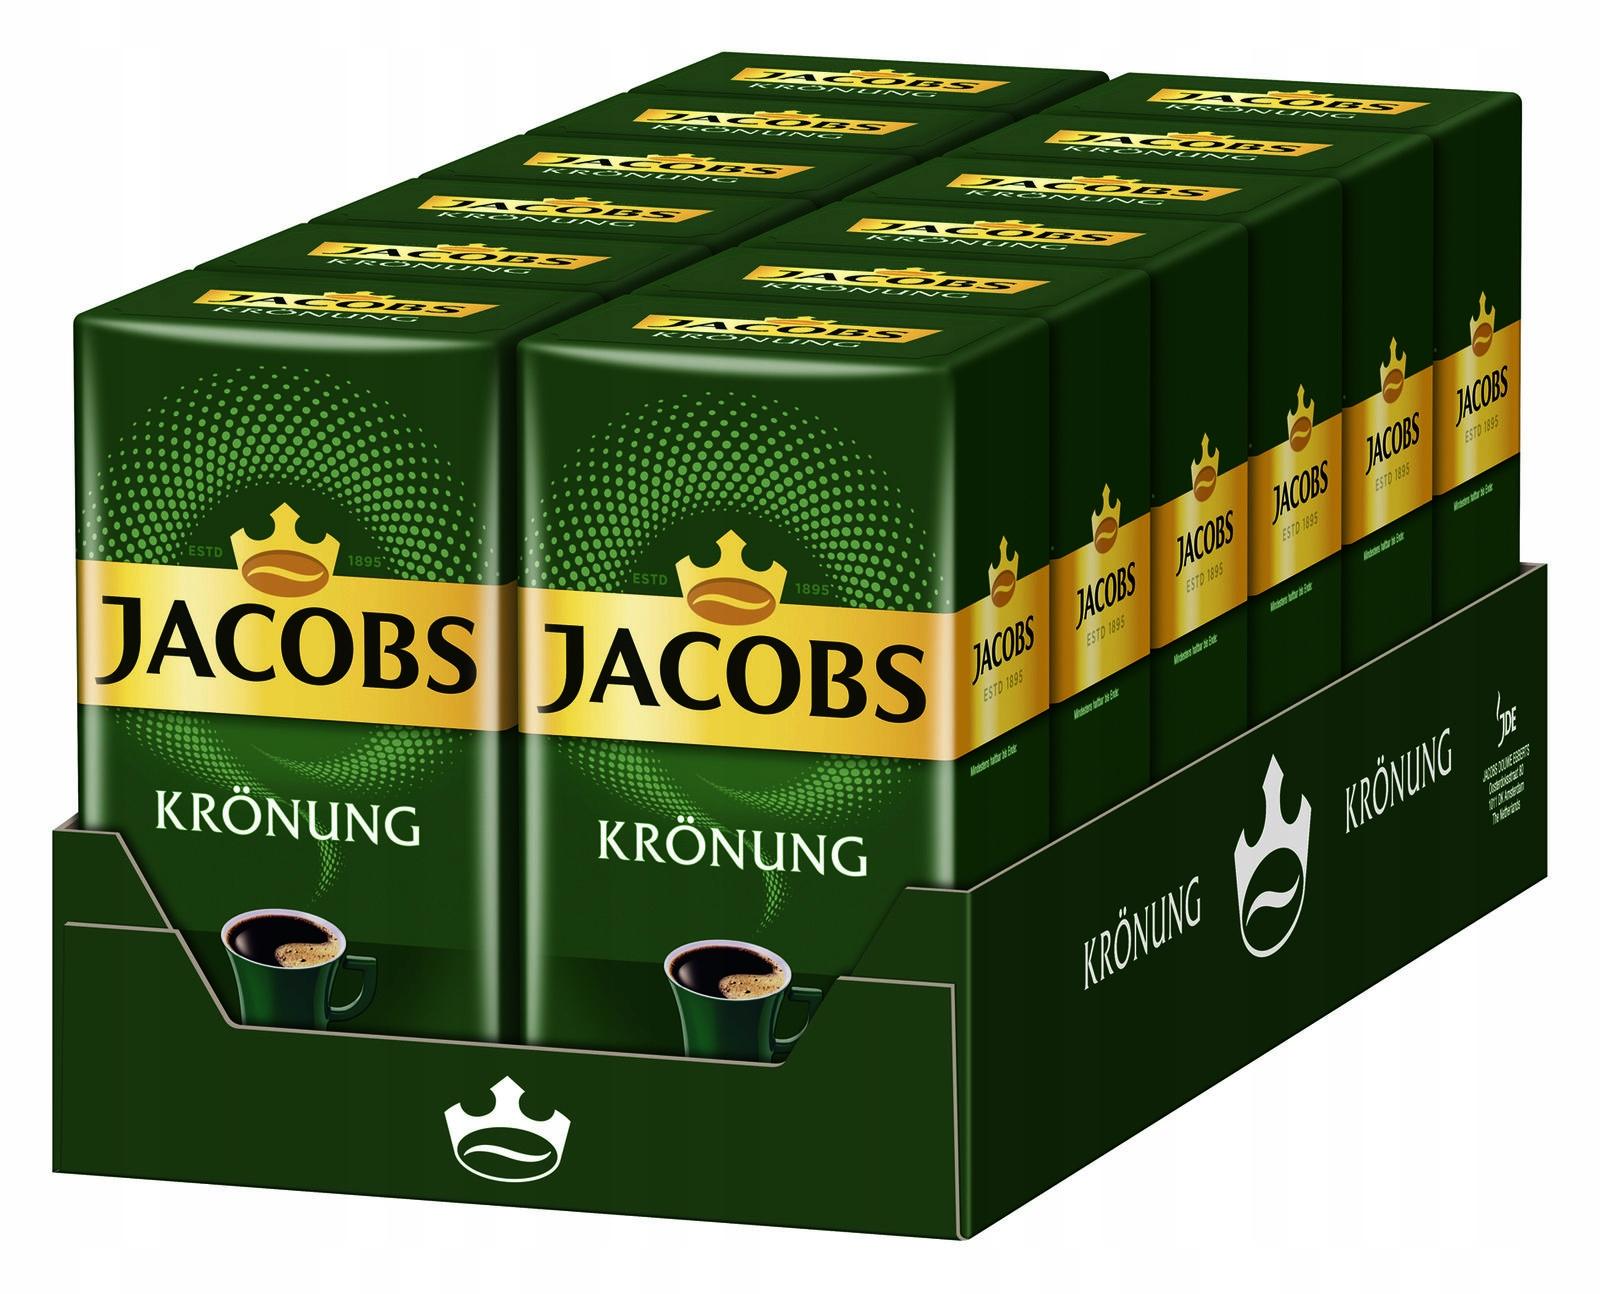 Jacobs Kronung kawa mielona box 12x500g=6kg